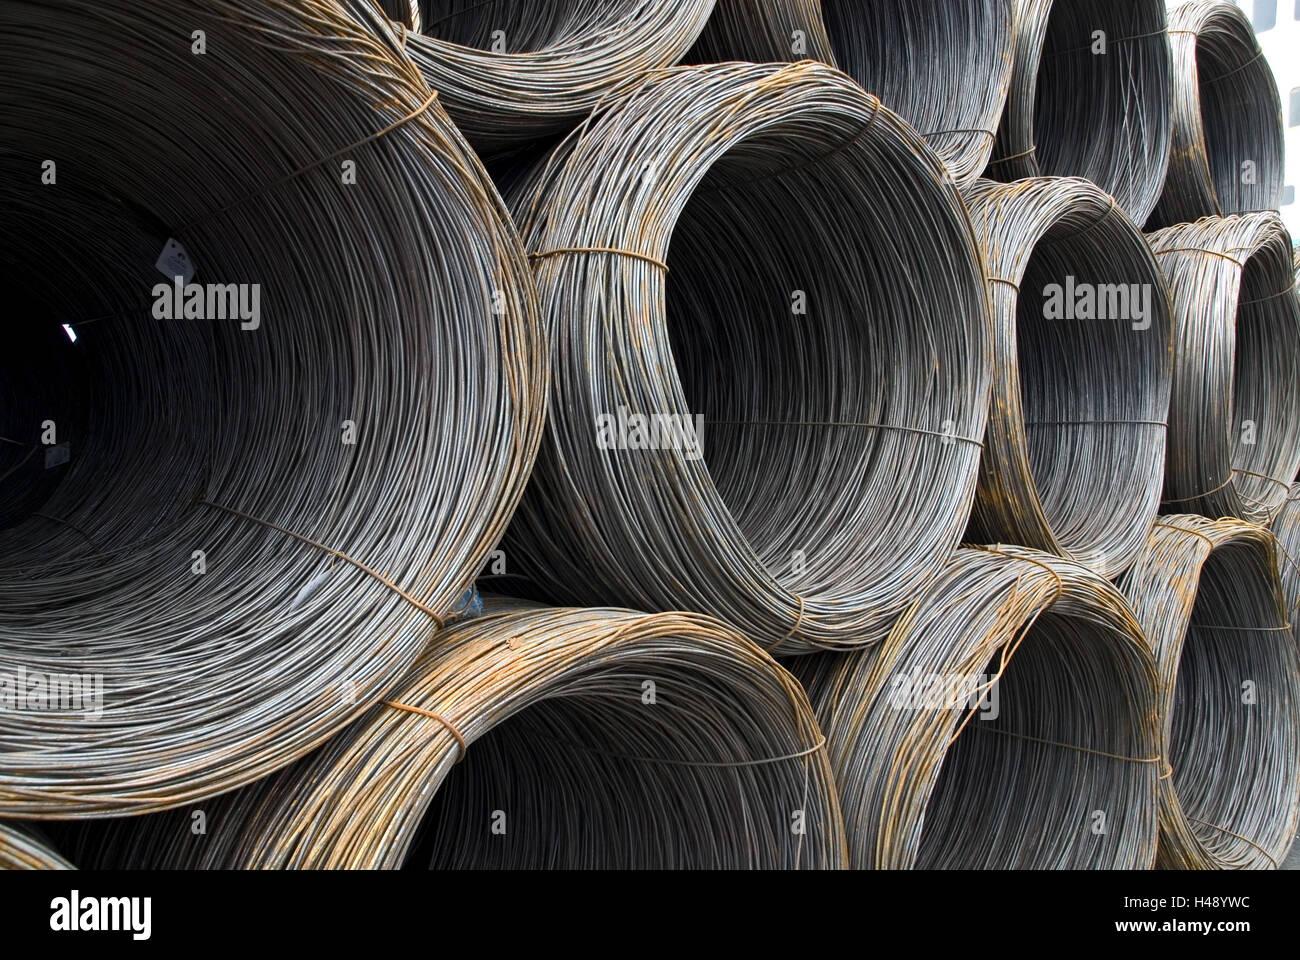 Scrolled Metal Stockfotos & Scrolled Metal Bilder - Alamy